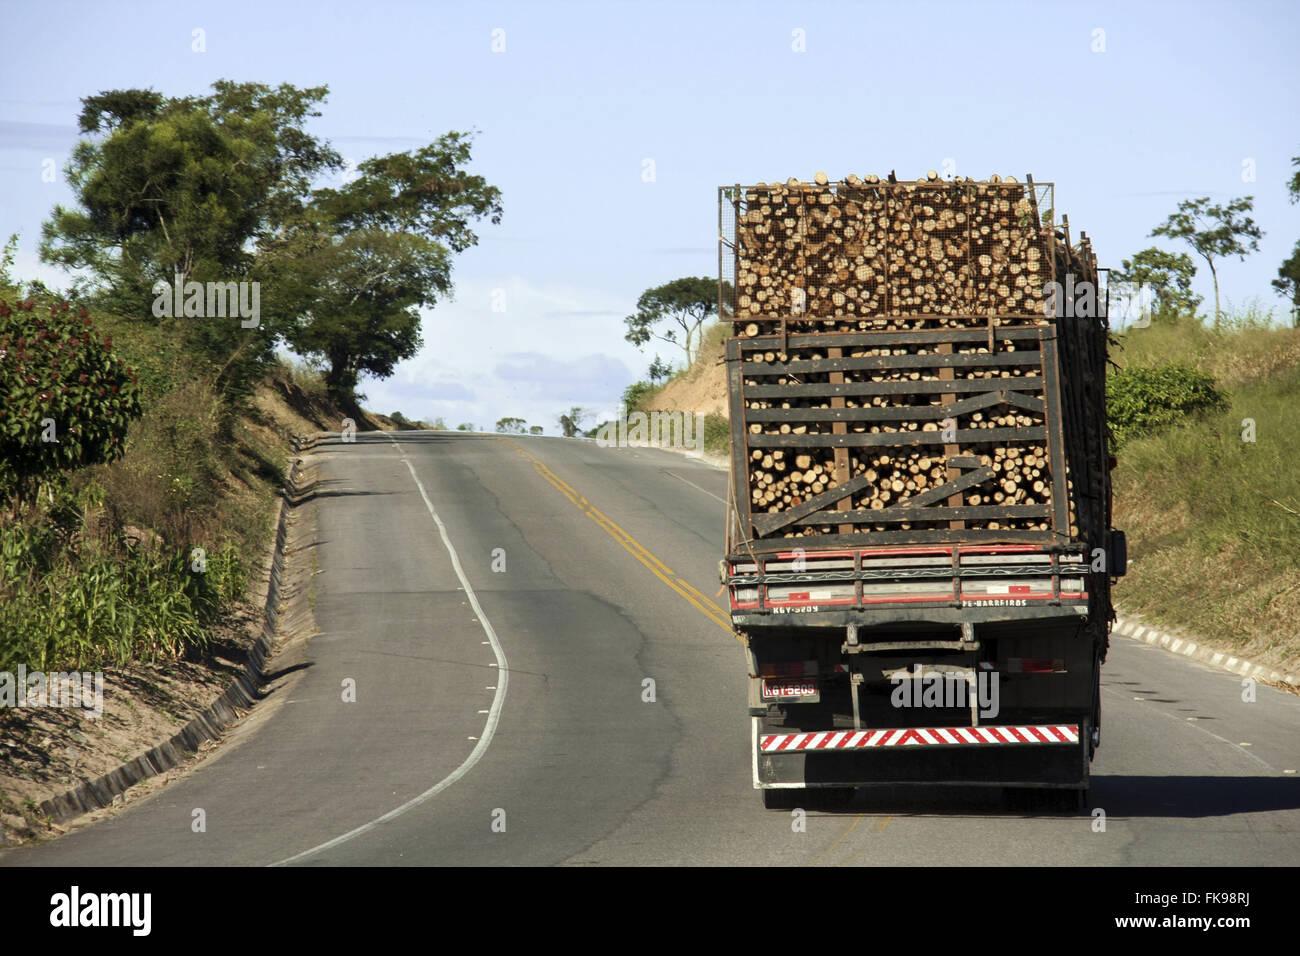 Truck carrying eucalyptus in highway RJ-224 - the municipality of Sao Francisco de Itabapoana - RJ - Stock Image